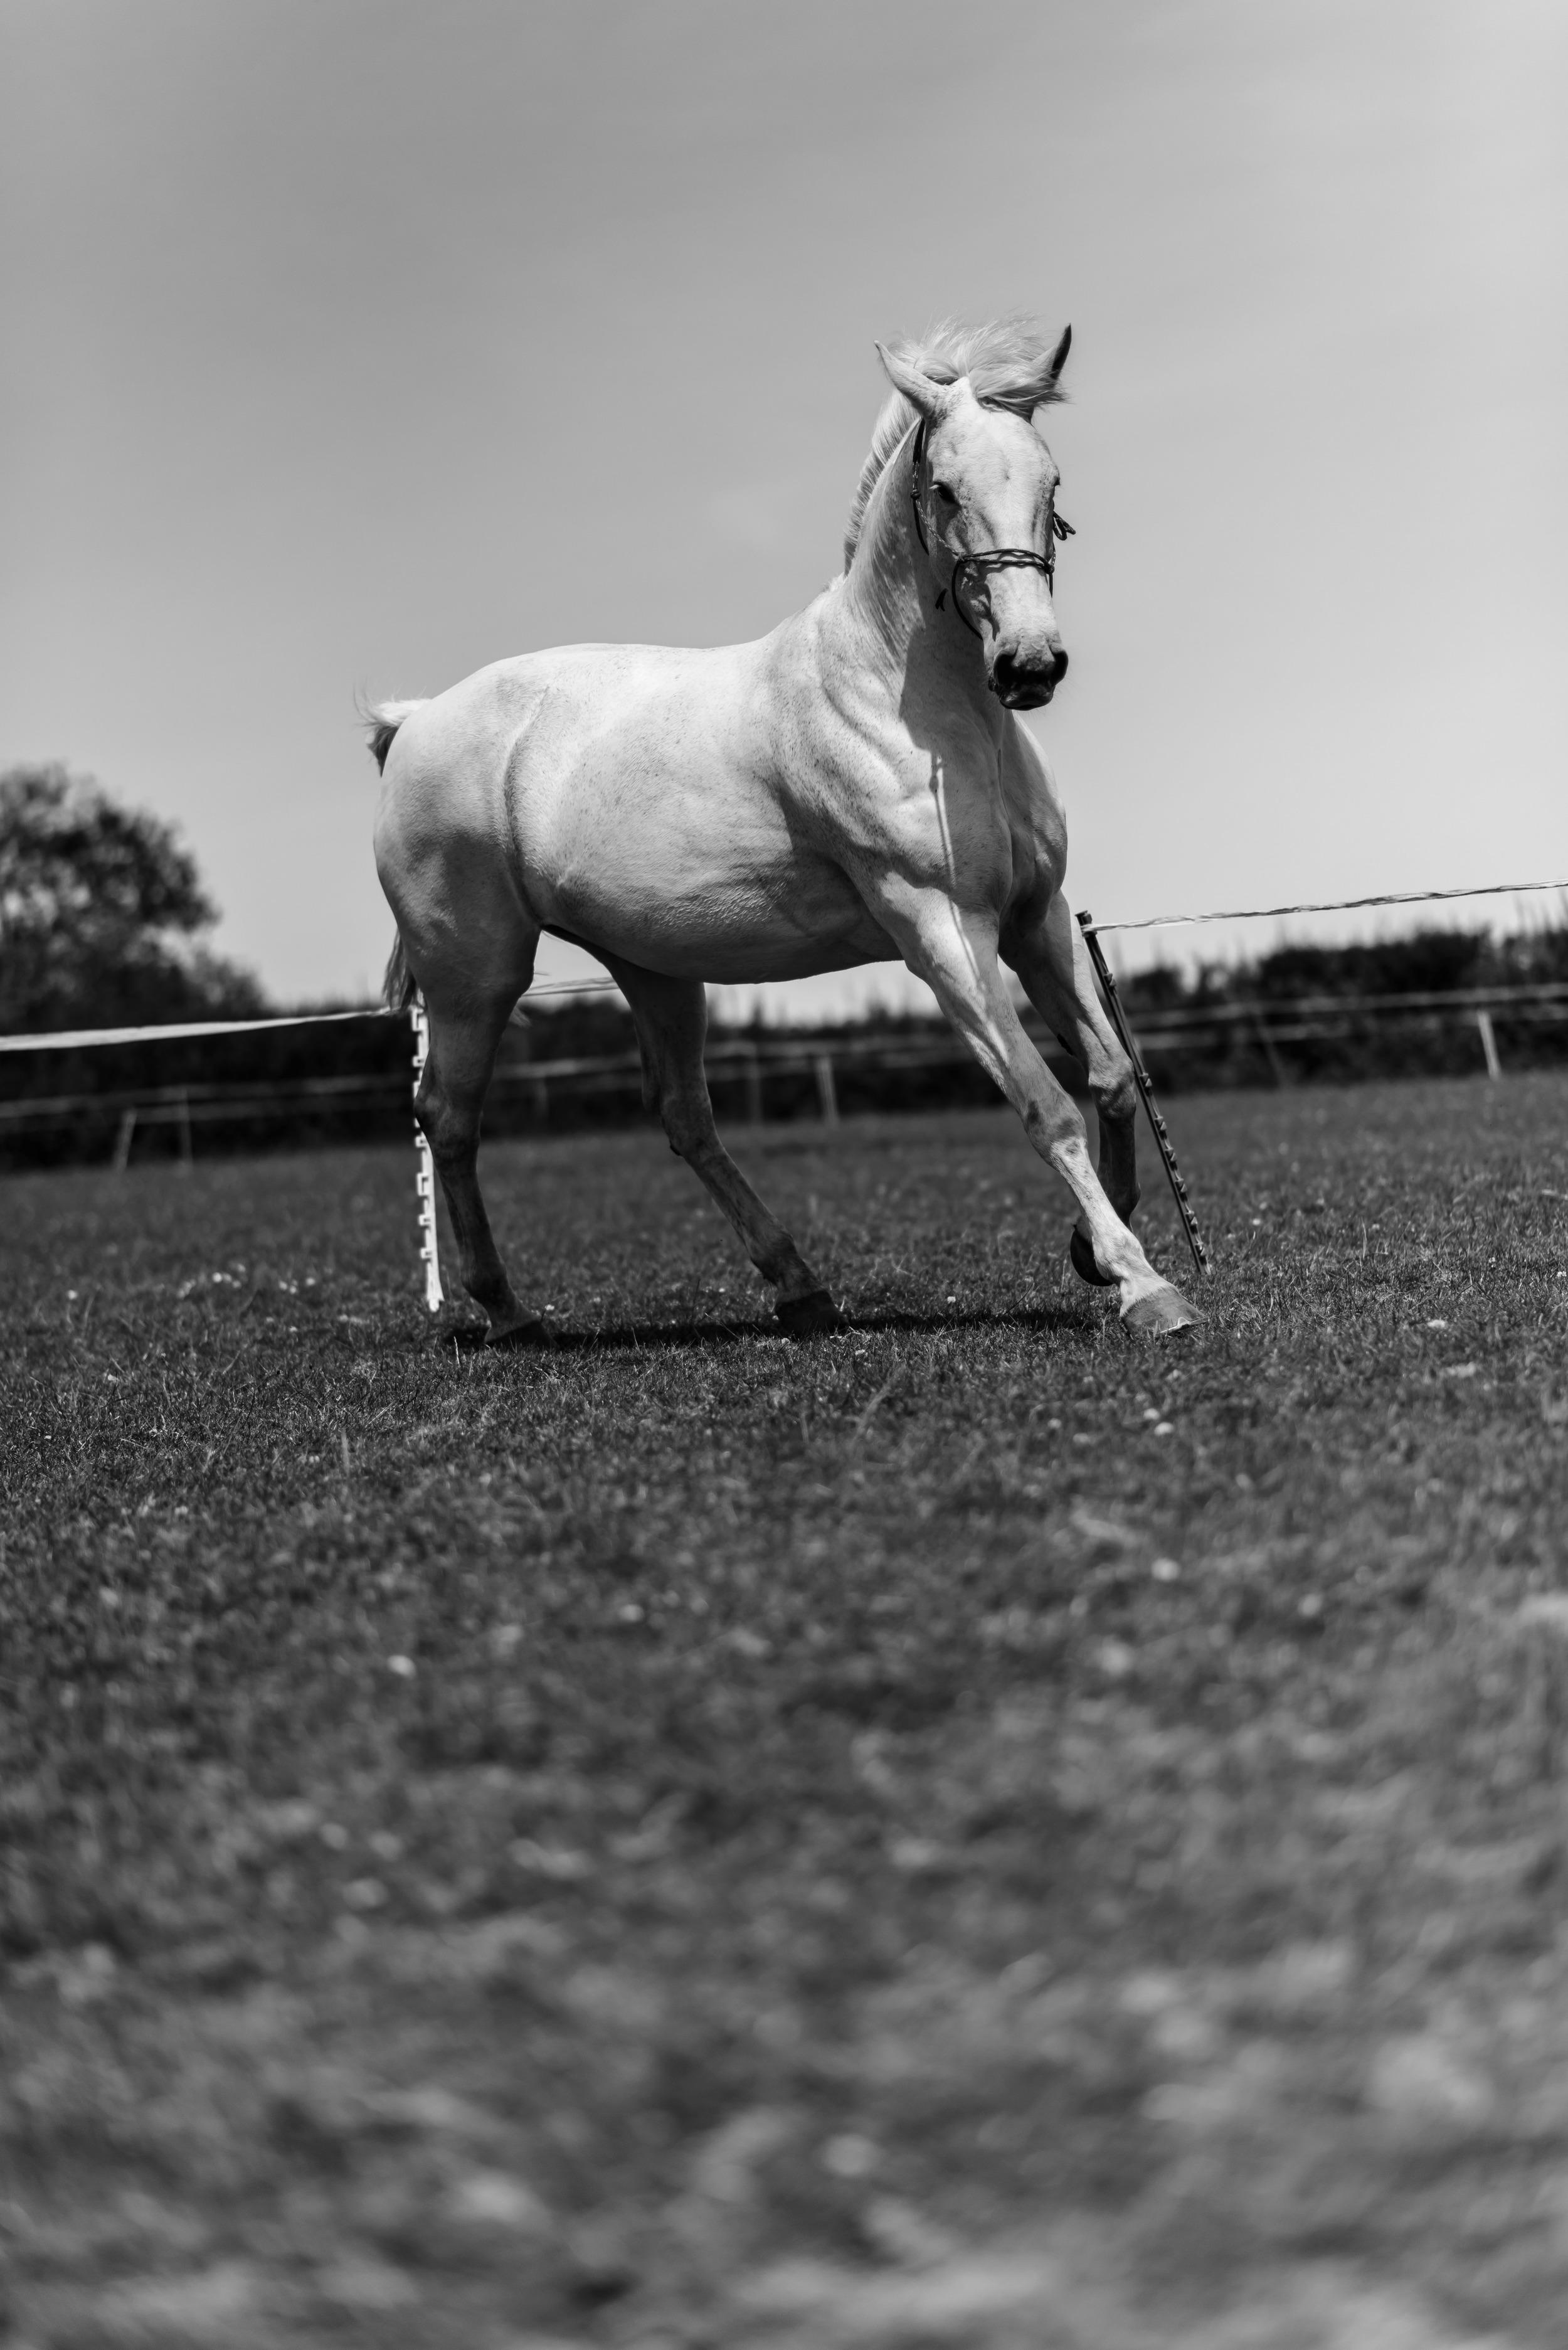 PLP_Horses_JessD_15-8.jpg